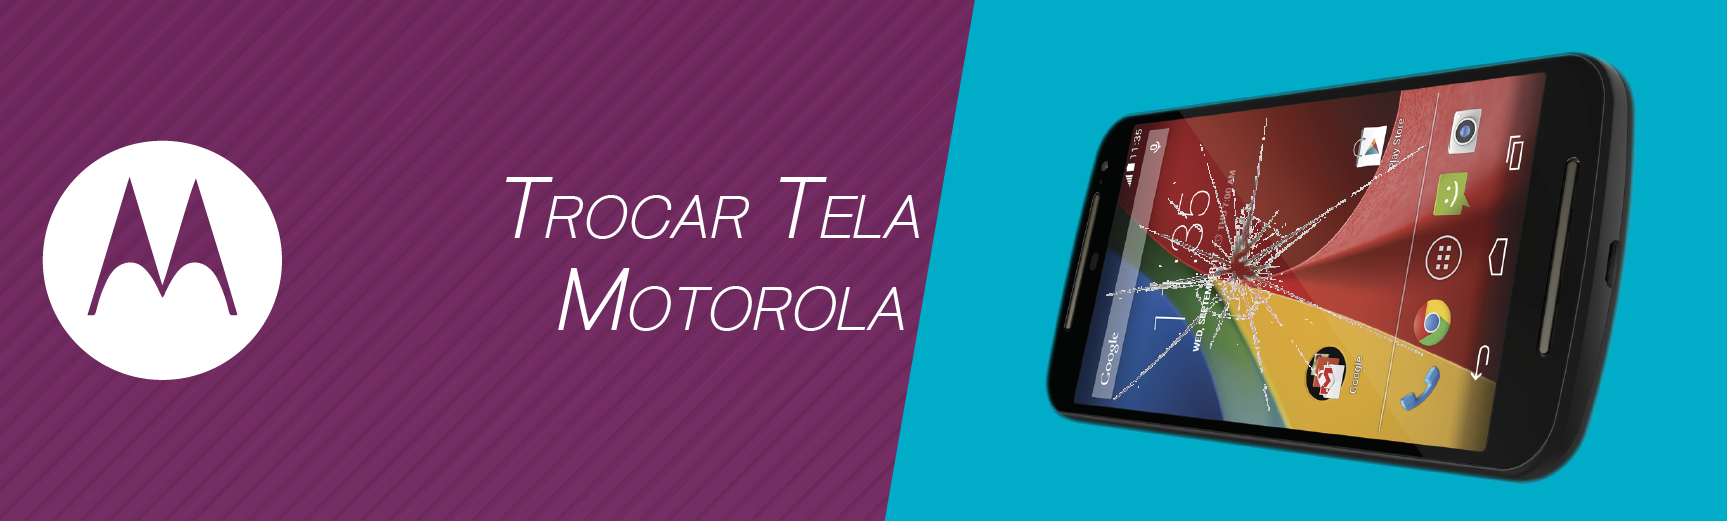 Trocar Tela Motorola